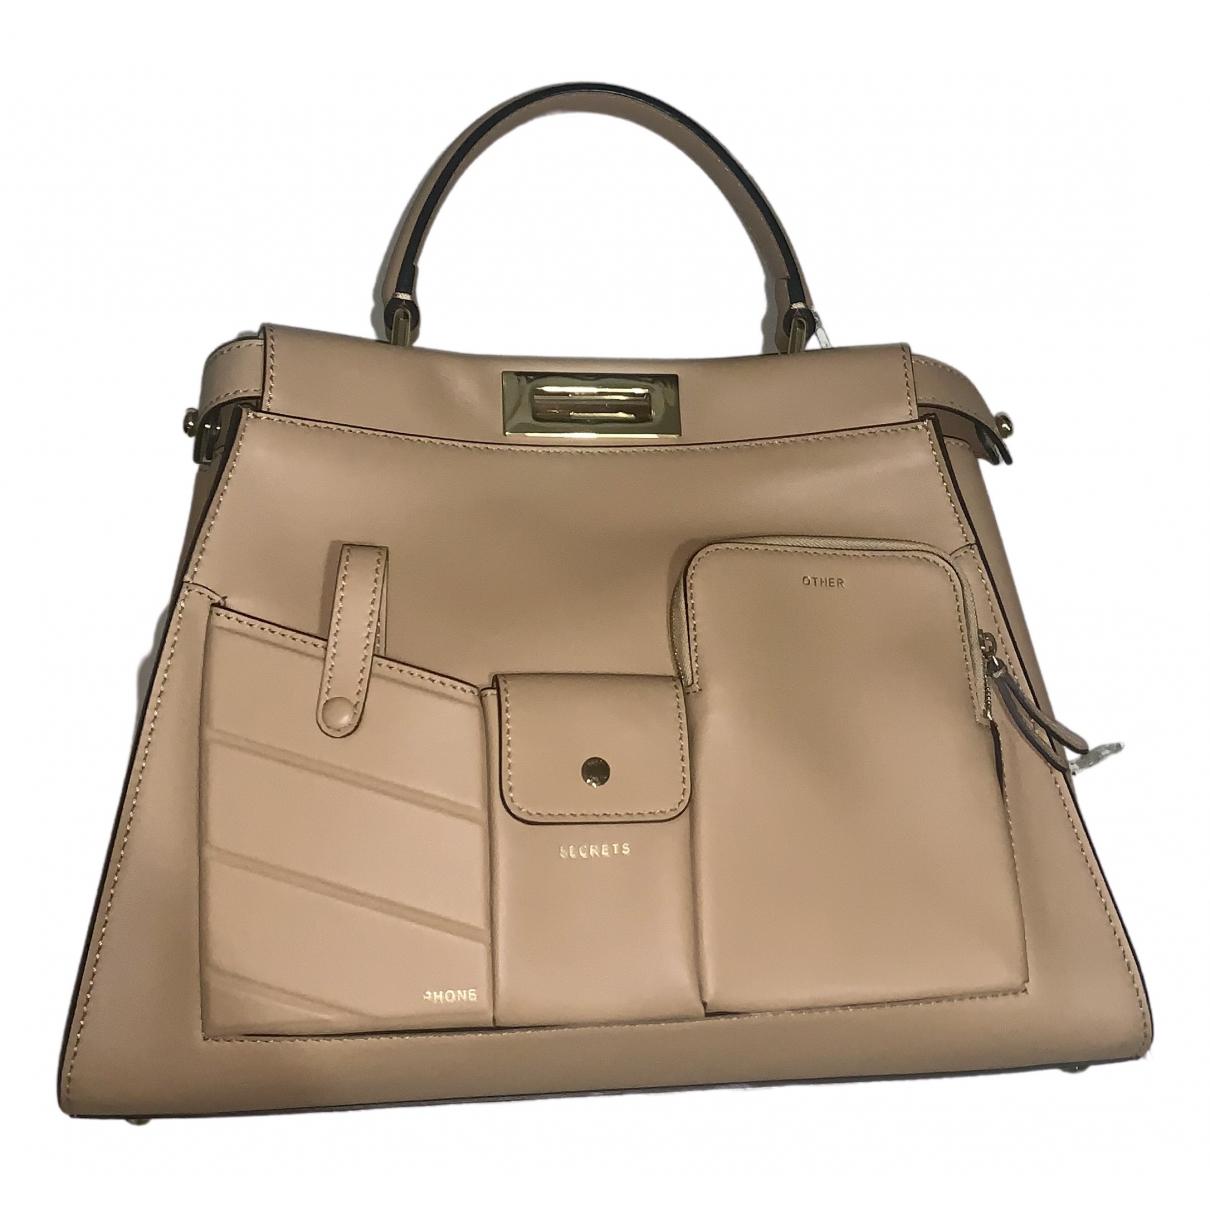 Fendi Peekaboo regular pocket Handtasche in  Kamel Leder